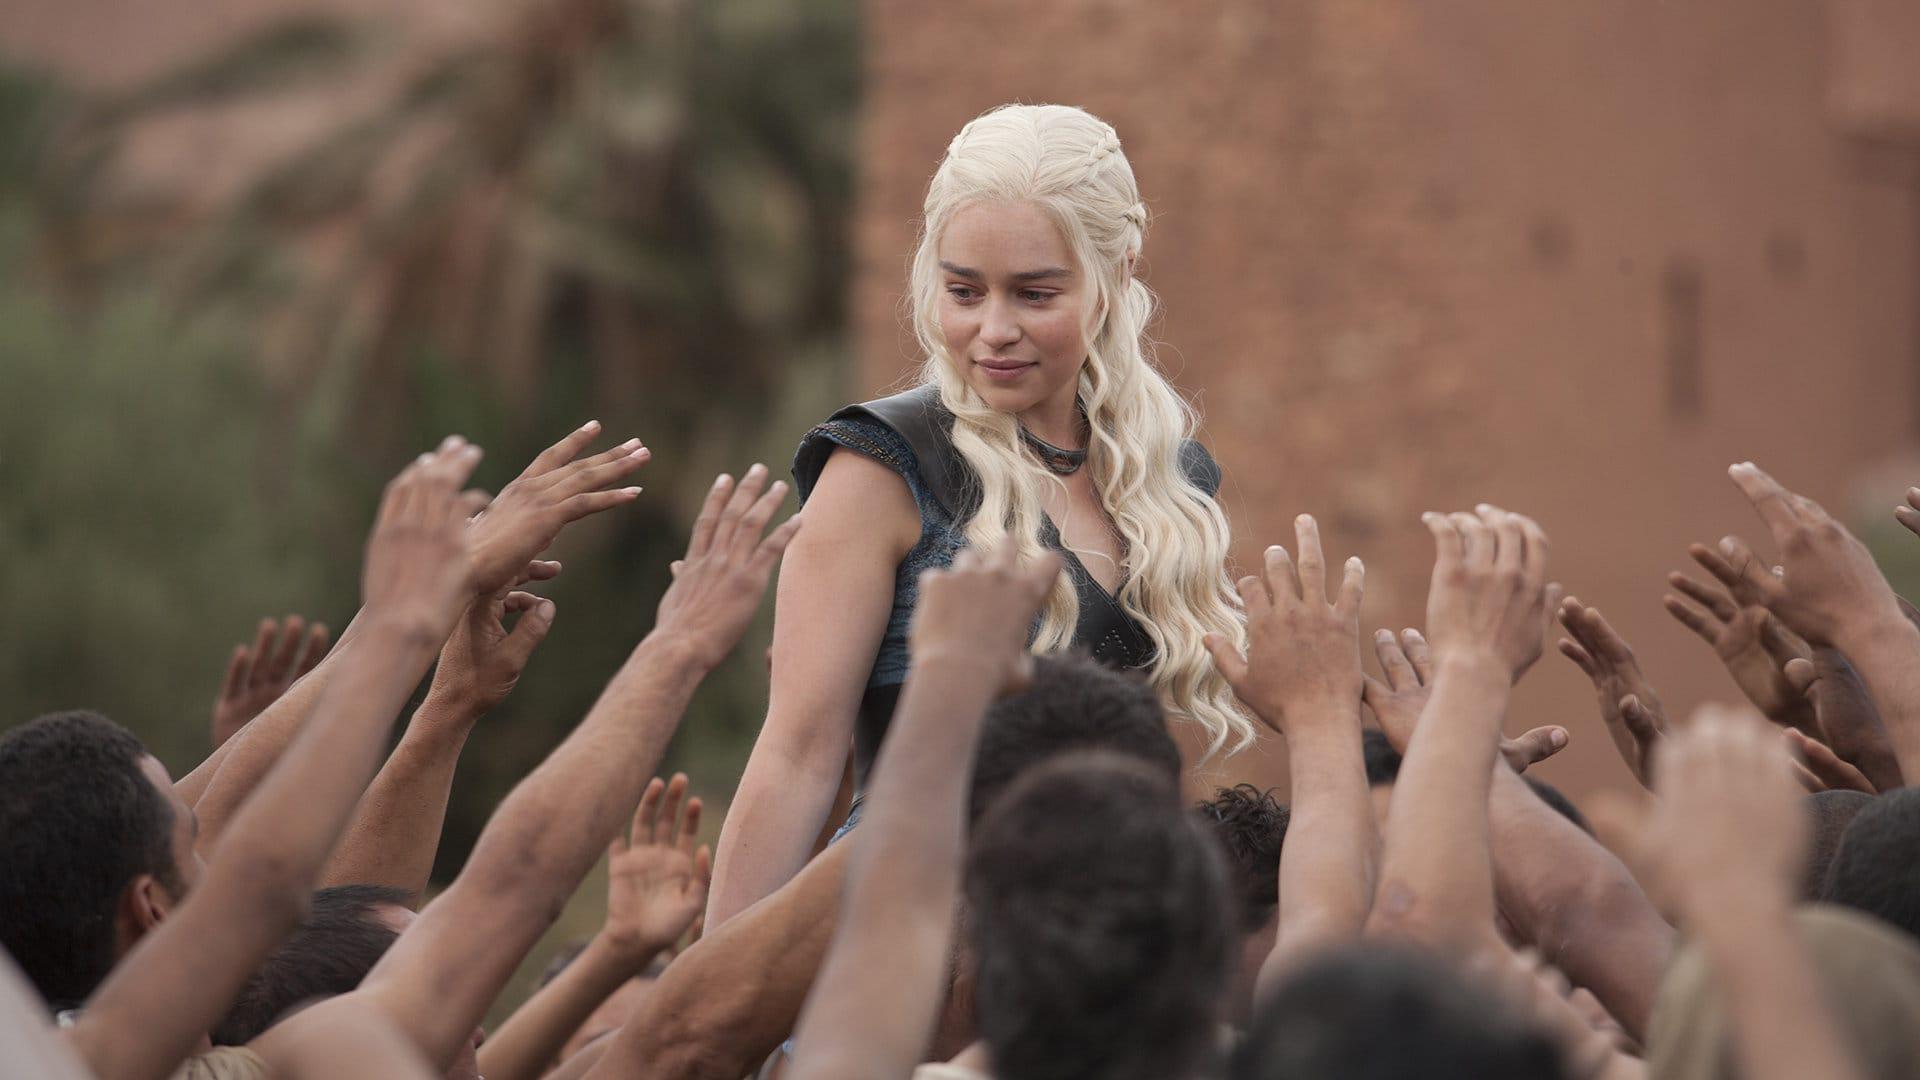 Game of Thrones - Mhysa